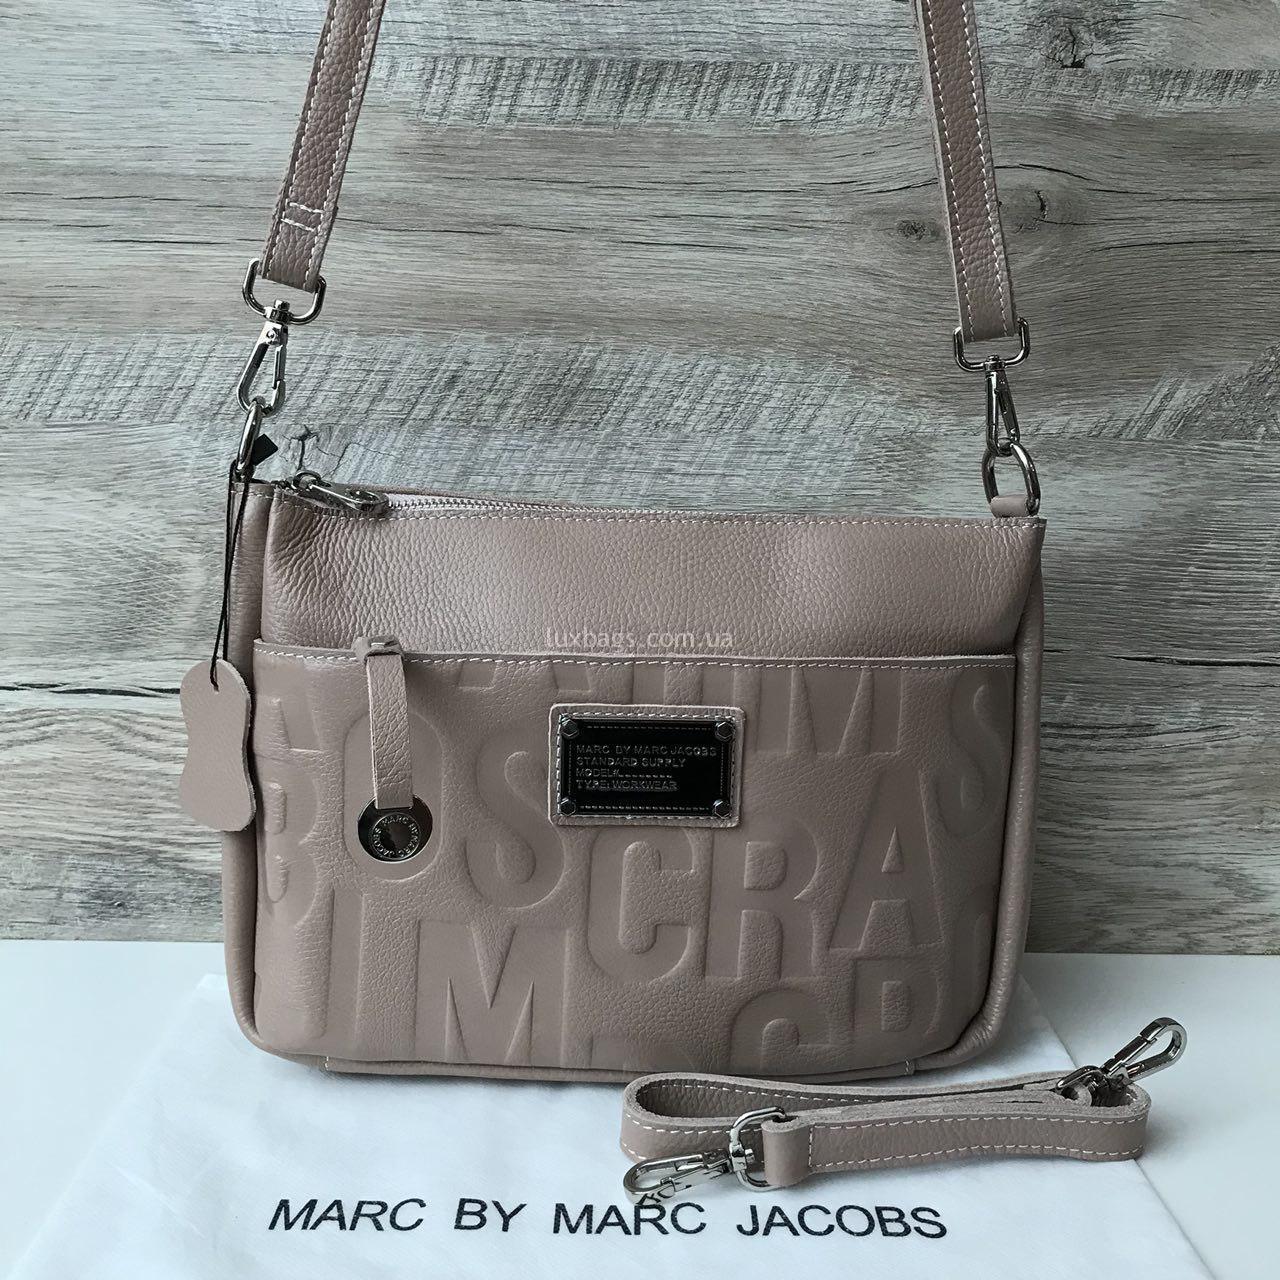 b8bfd4c668a8 Женская кожаная сумка Marc Jacobs Купить на lux-bags